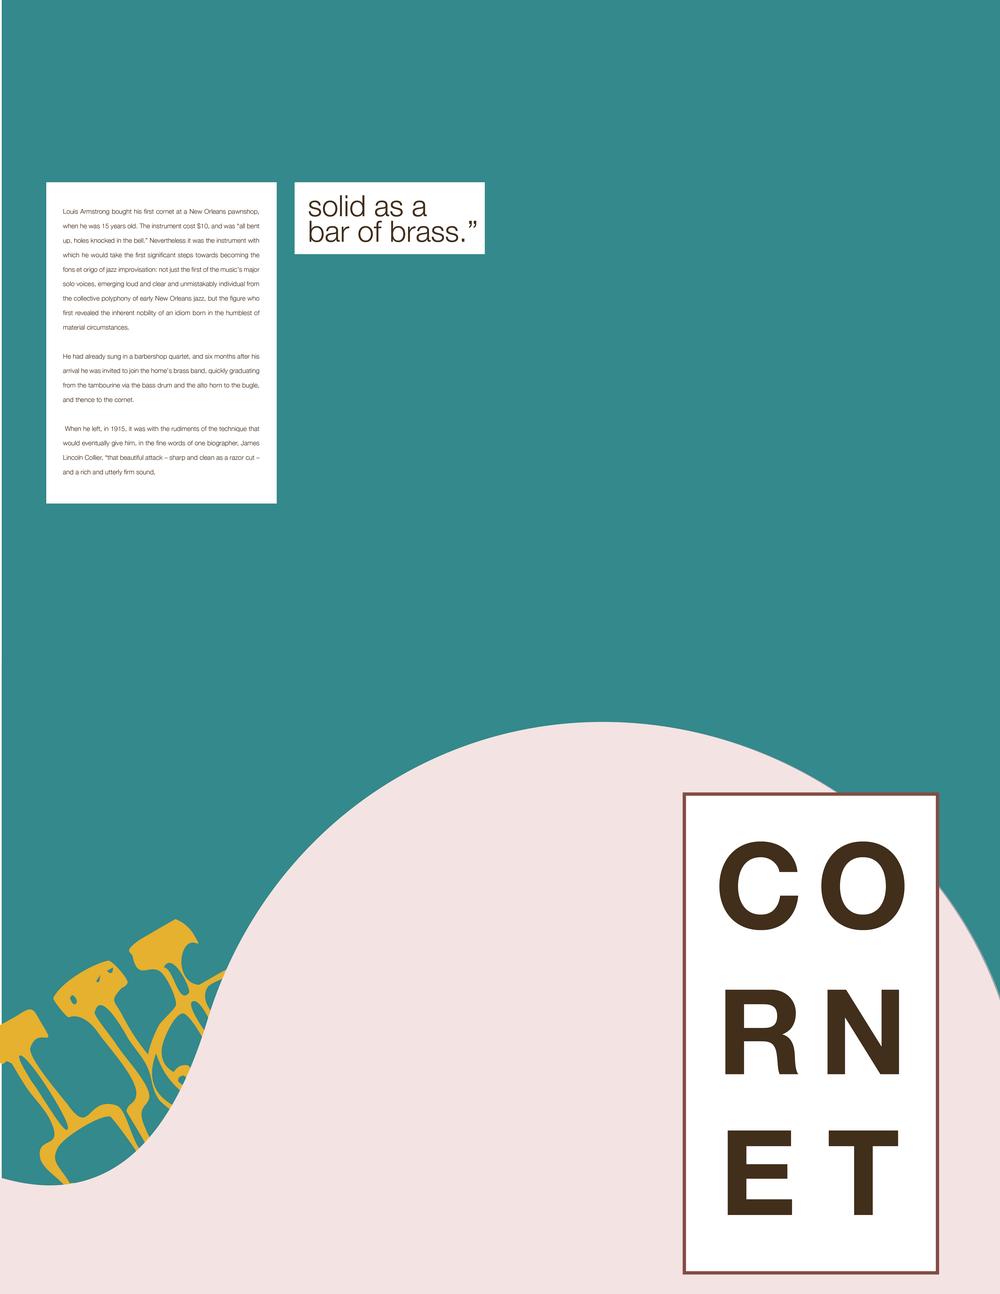 Cornet_Final_Contenders-05.png